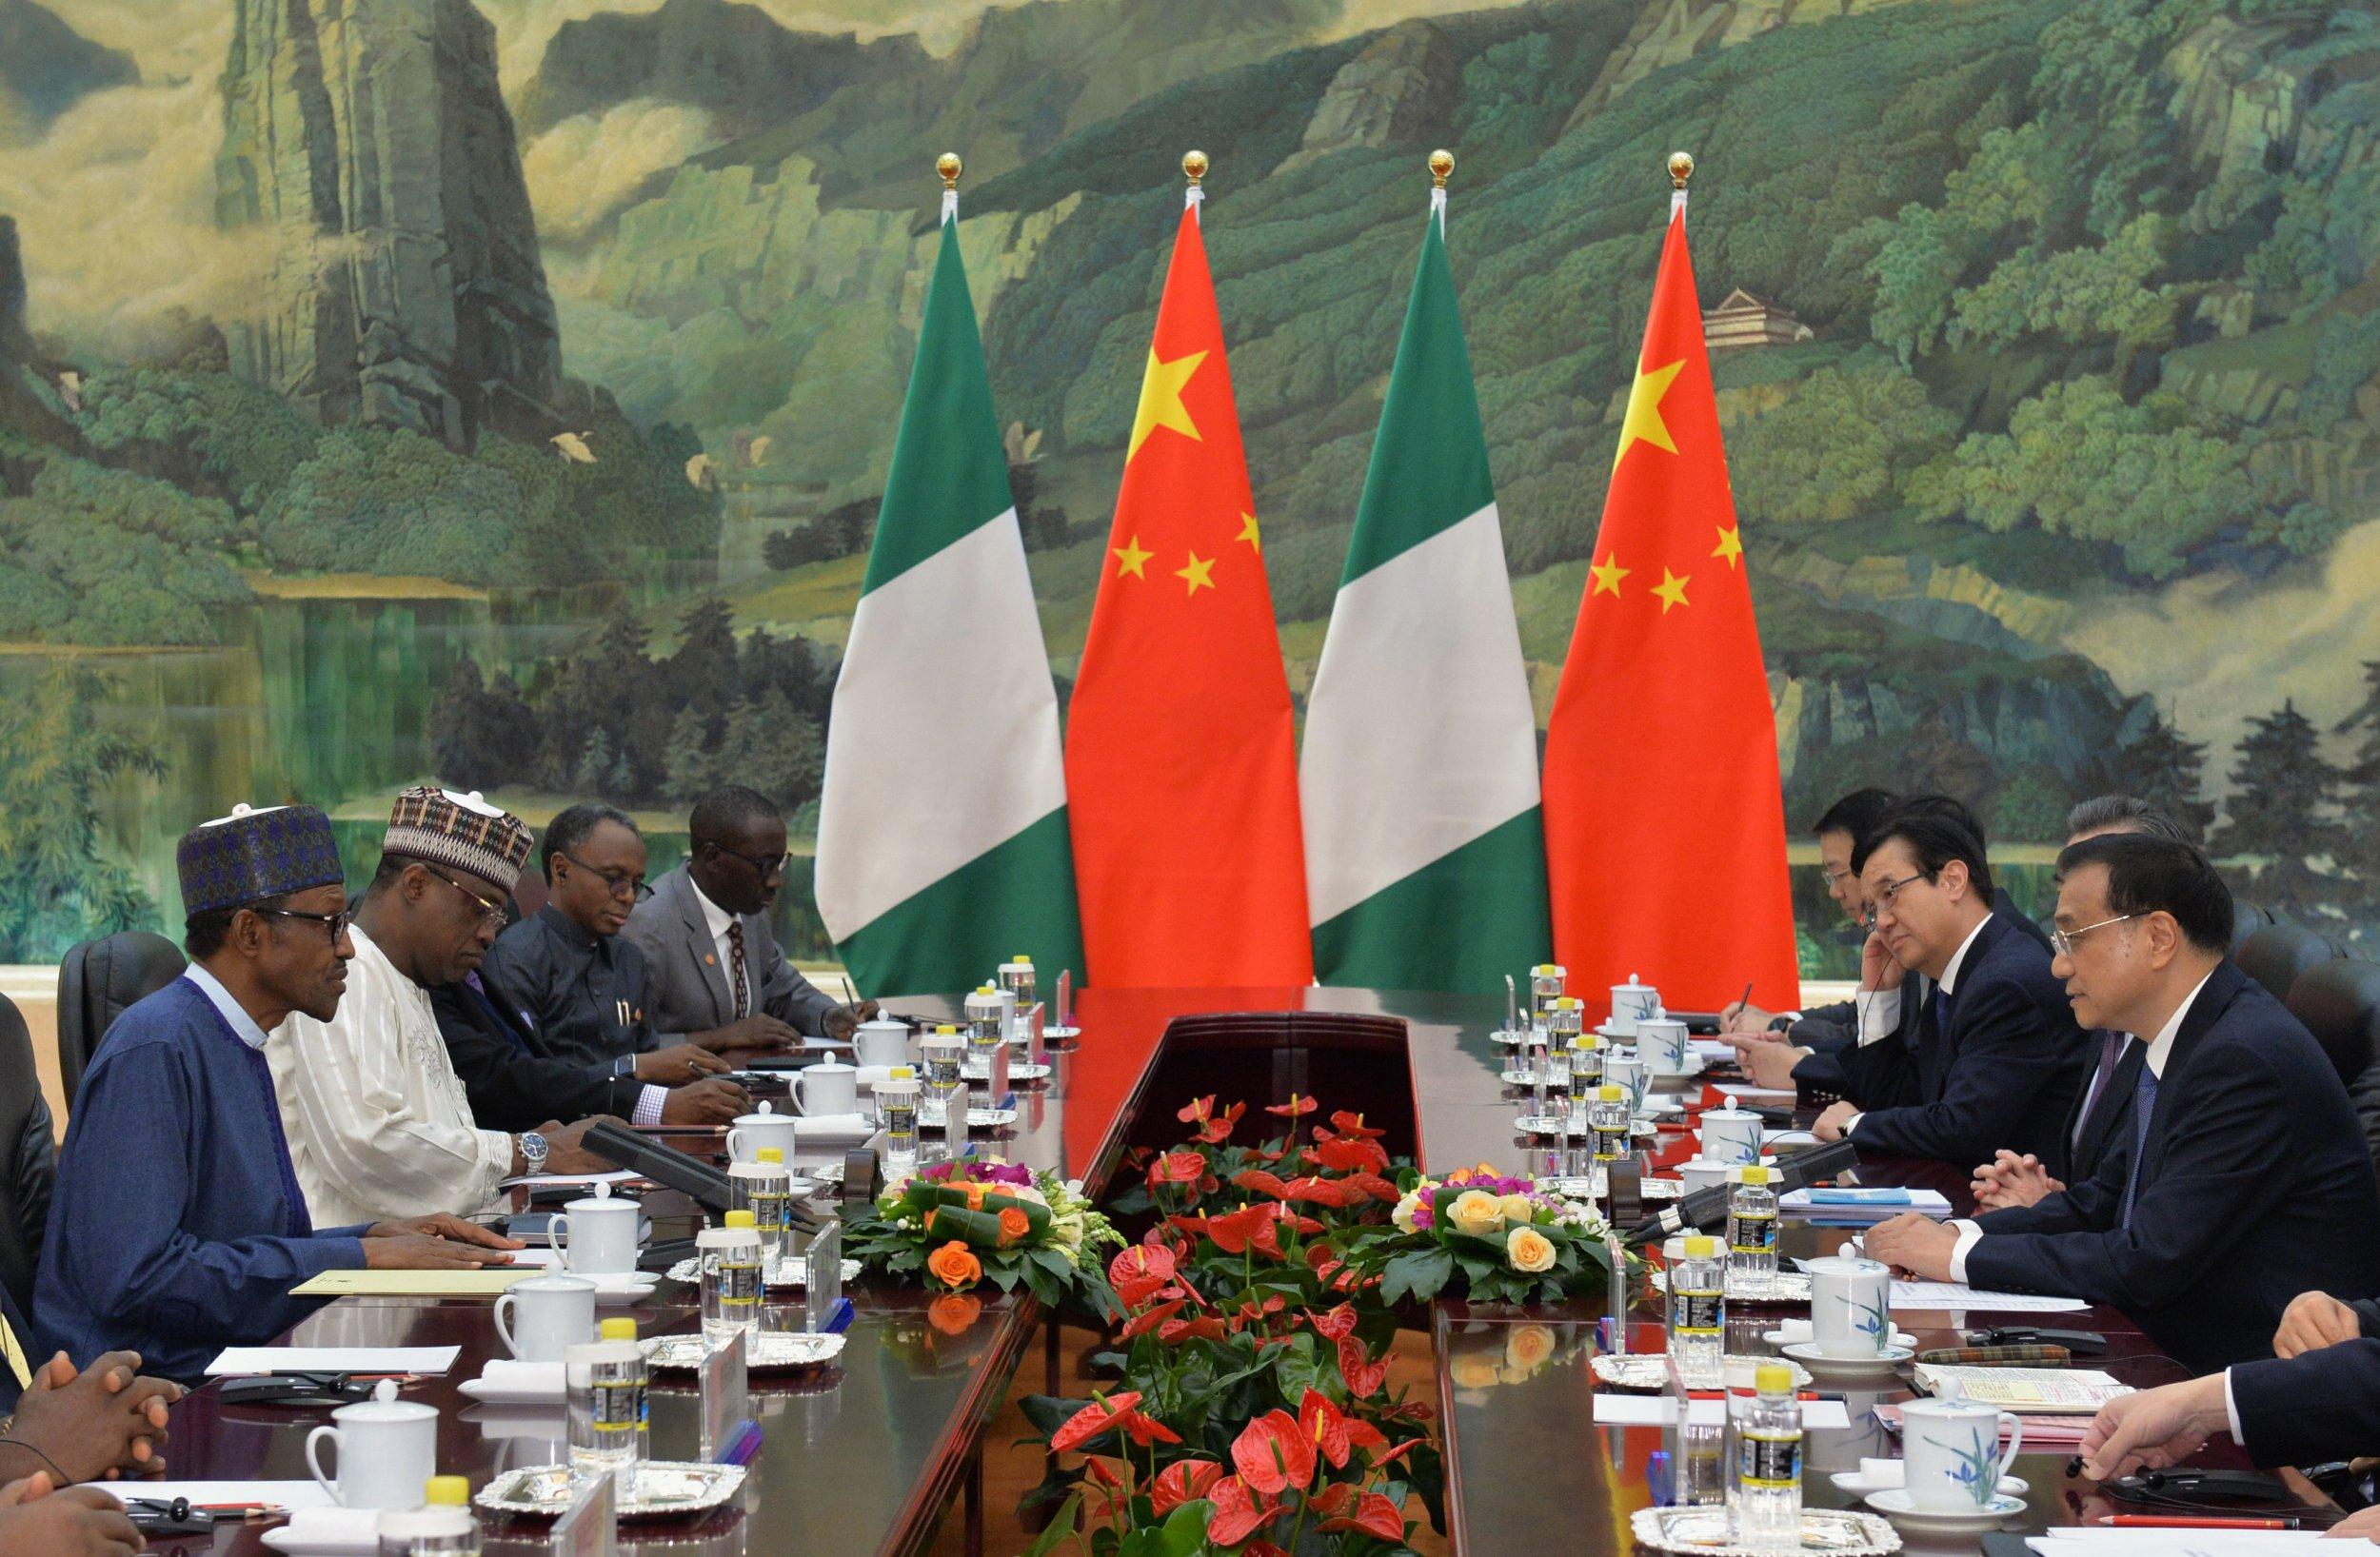 Nigerian President Muhammadu Buhari meets Chinese Premier Li Keqiang in Beijing.